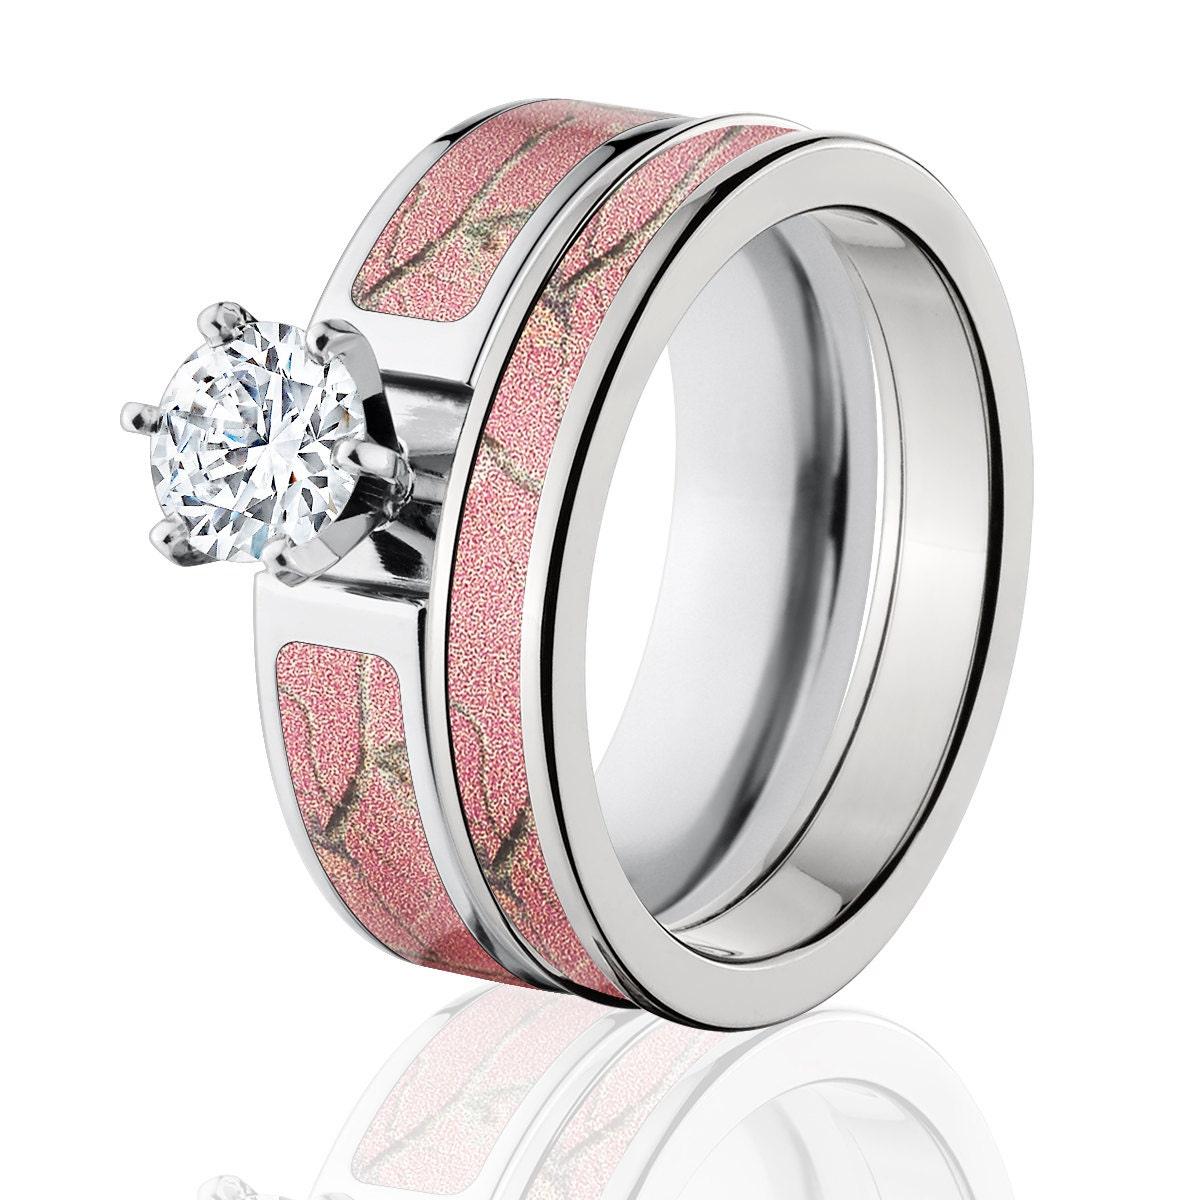 2b87f6b29 Cobalt Camo Bridal Set with 1ct Round CZ RealTree AP Pink Camo   Etsy